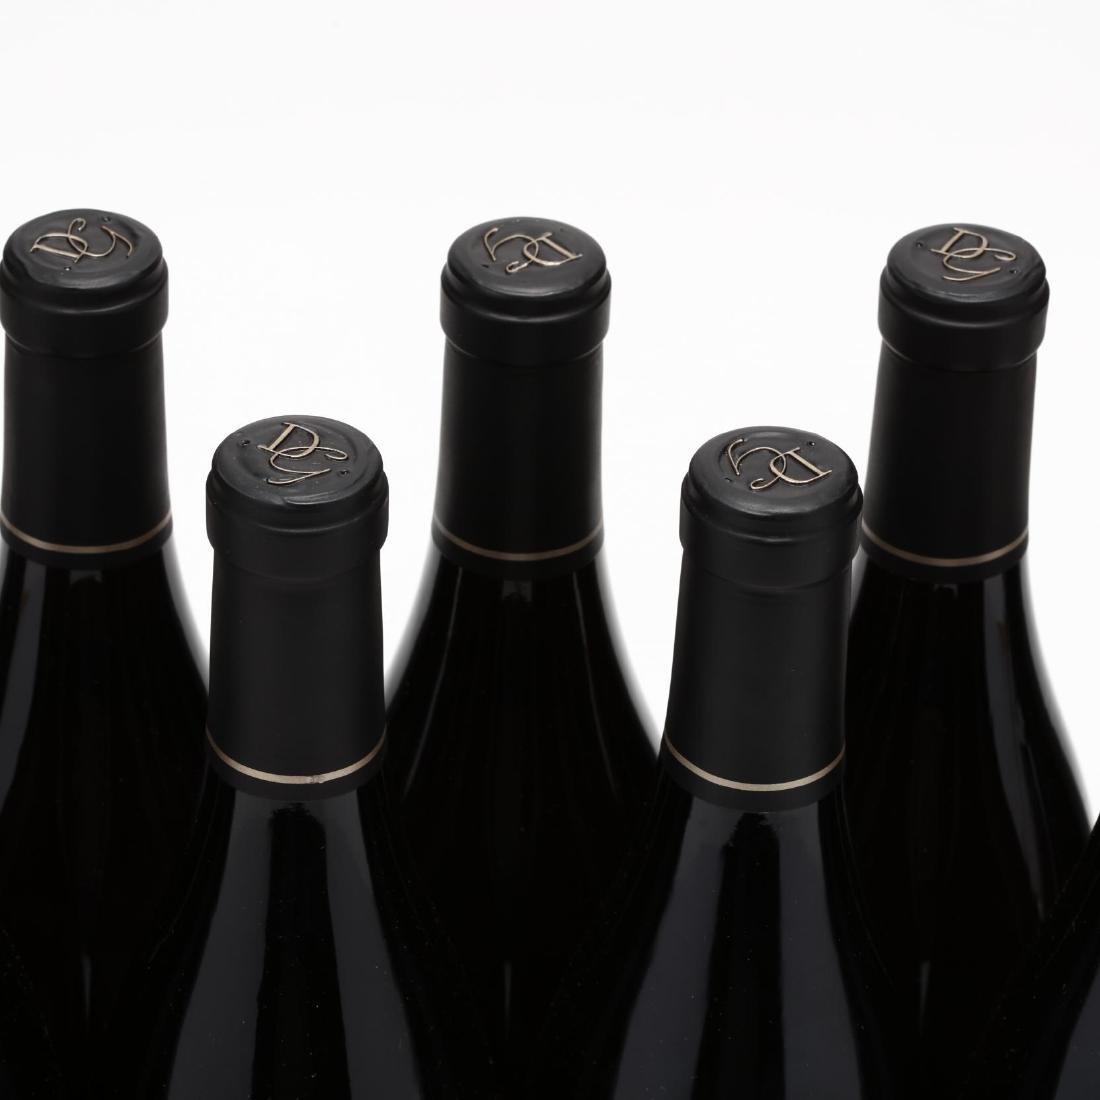 2012 Dutton-Goldfield Winery - 3